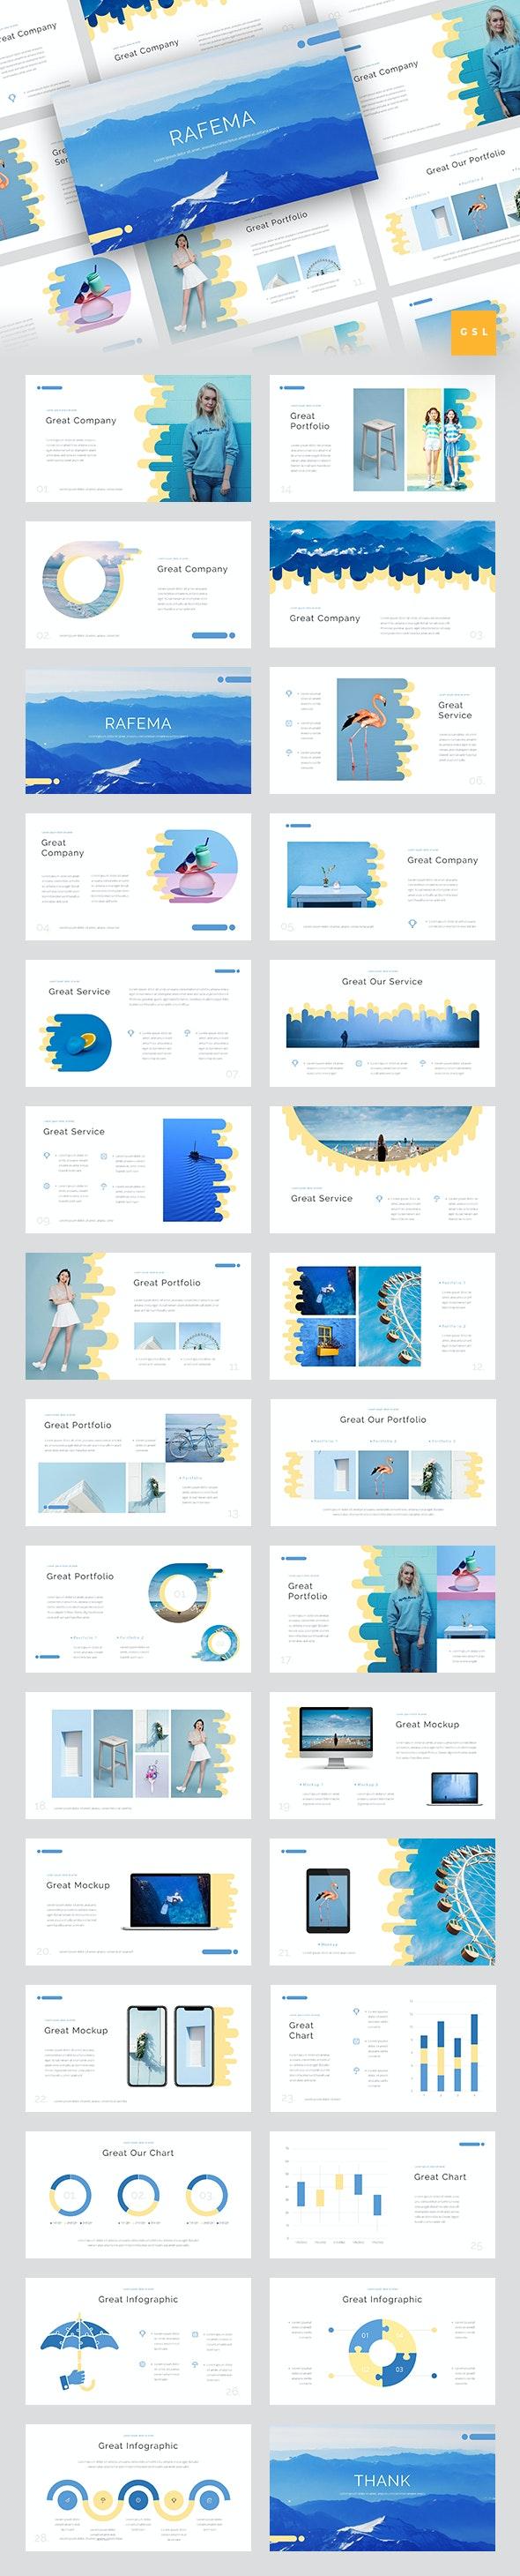 Rafema - Creative Google Slides Template - Google Slides Presentation Templates